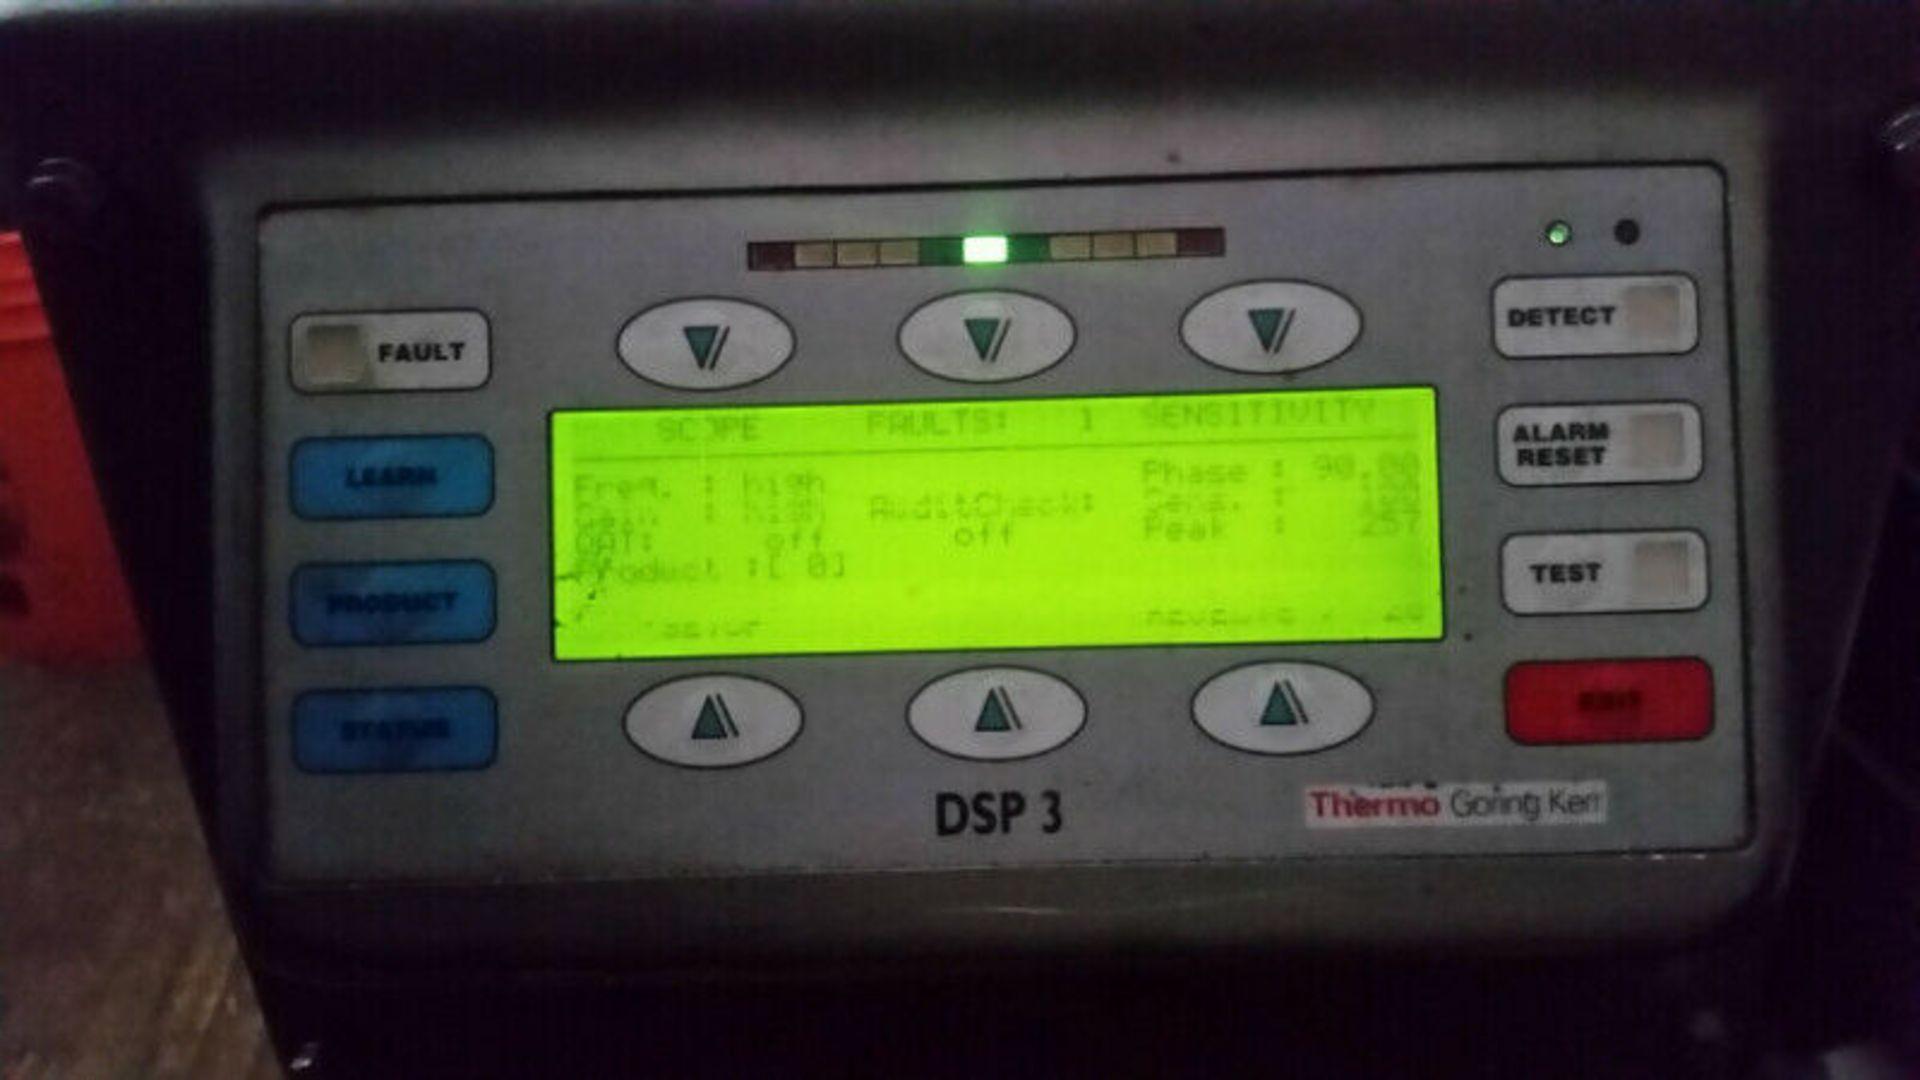 Thermo Goring Kerr Model DSP 3 Metal Detector S/N 06298304 - LOCATION - LONDON, ONTARIO - Image 2 of 4